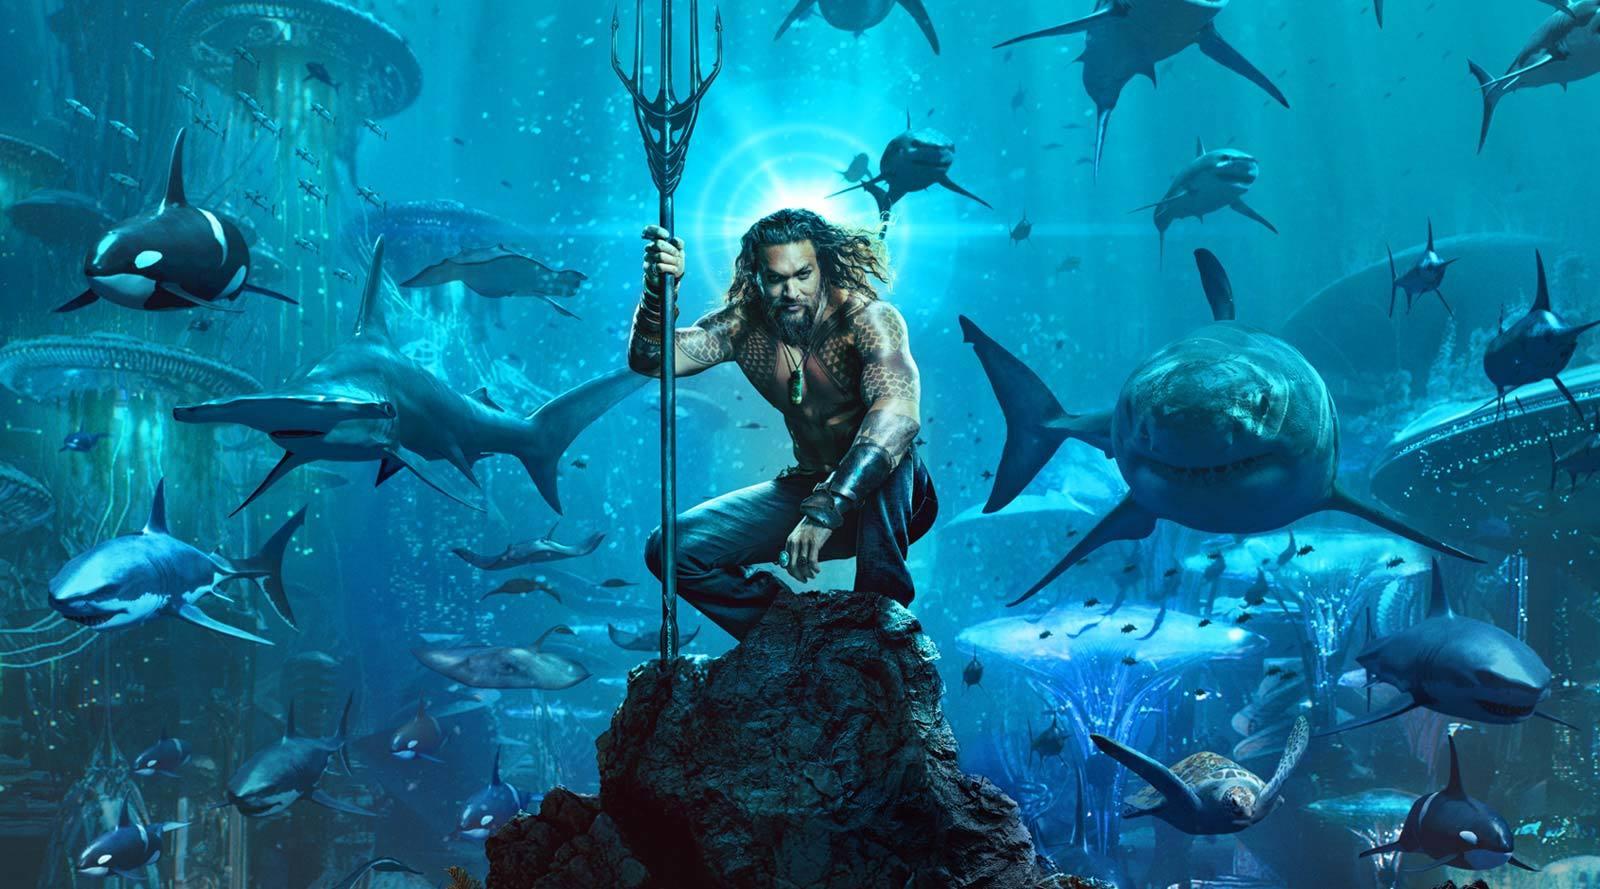 Star Wars Aquaman 2 box office